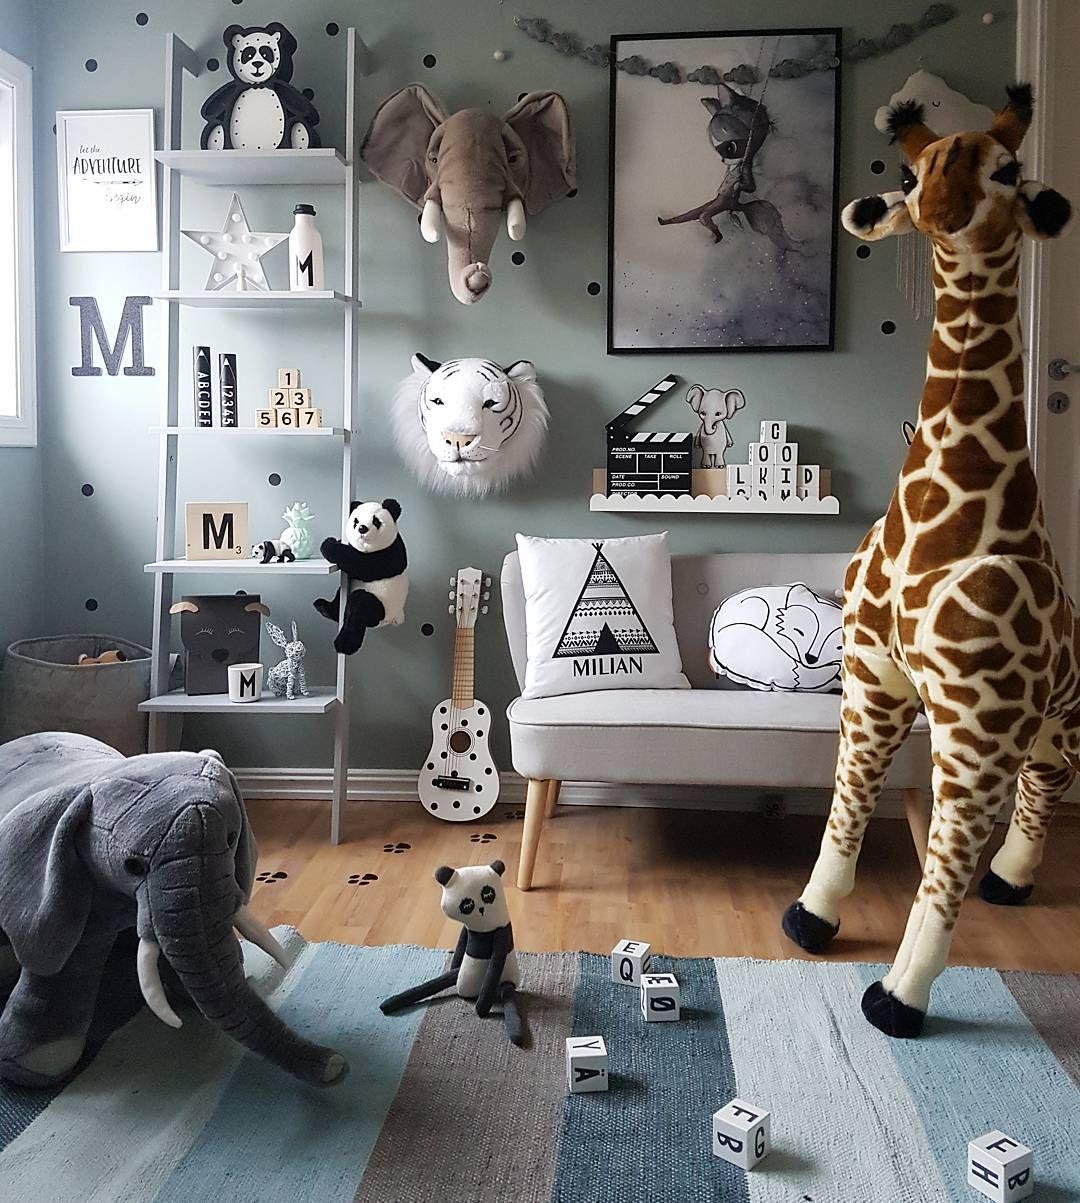 15 Ideas To Design A Jungle Themed Kids Room Kidsomania Themed Kids Room Kids Room Murals Kids Room Design